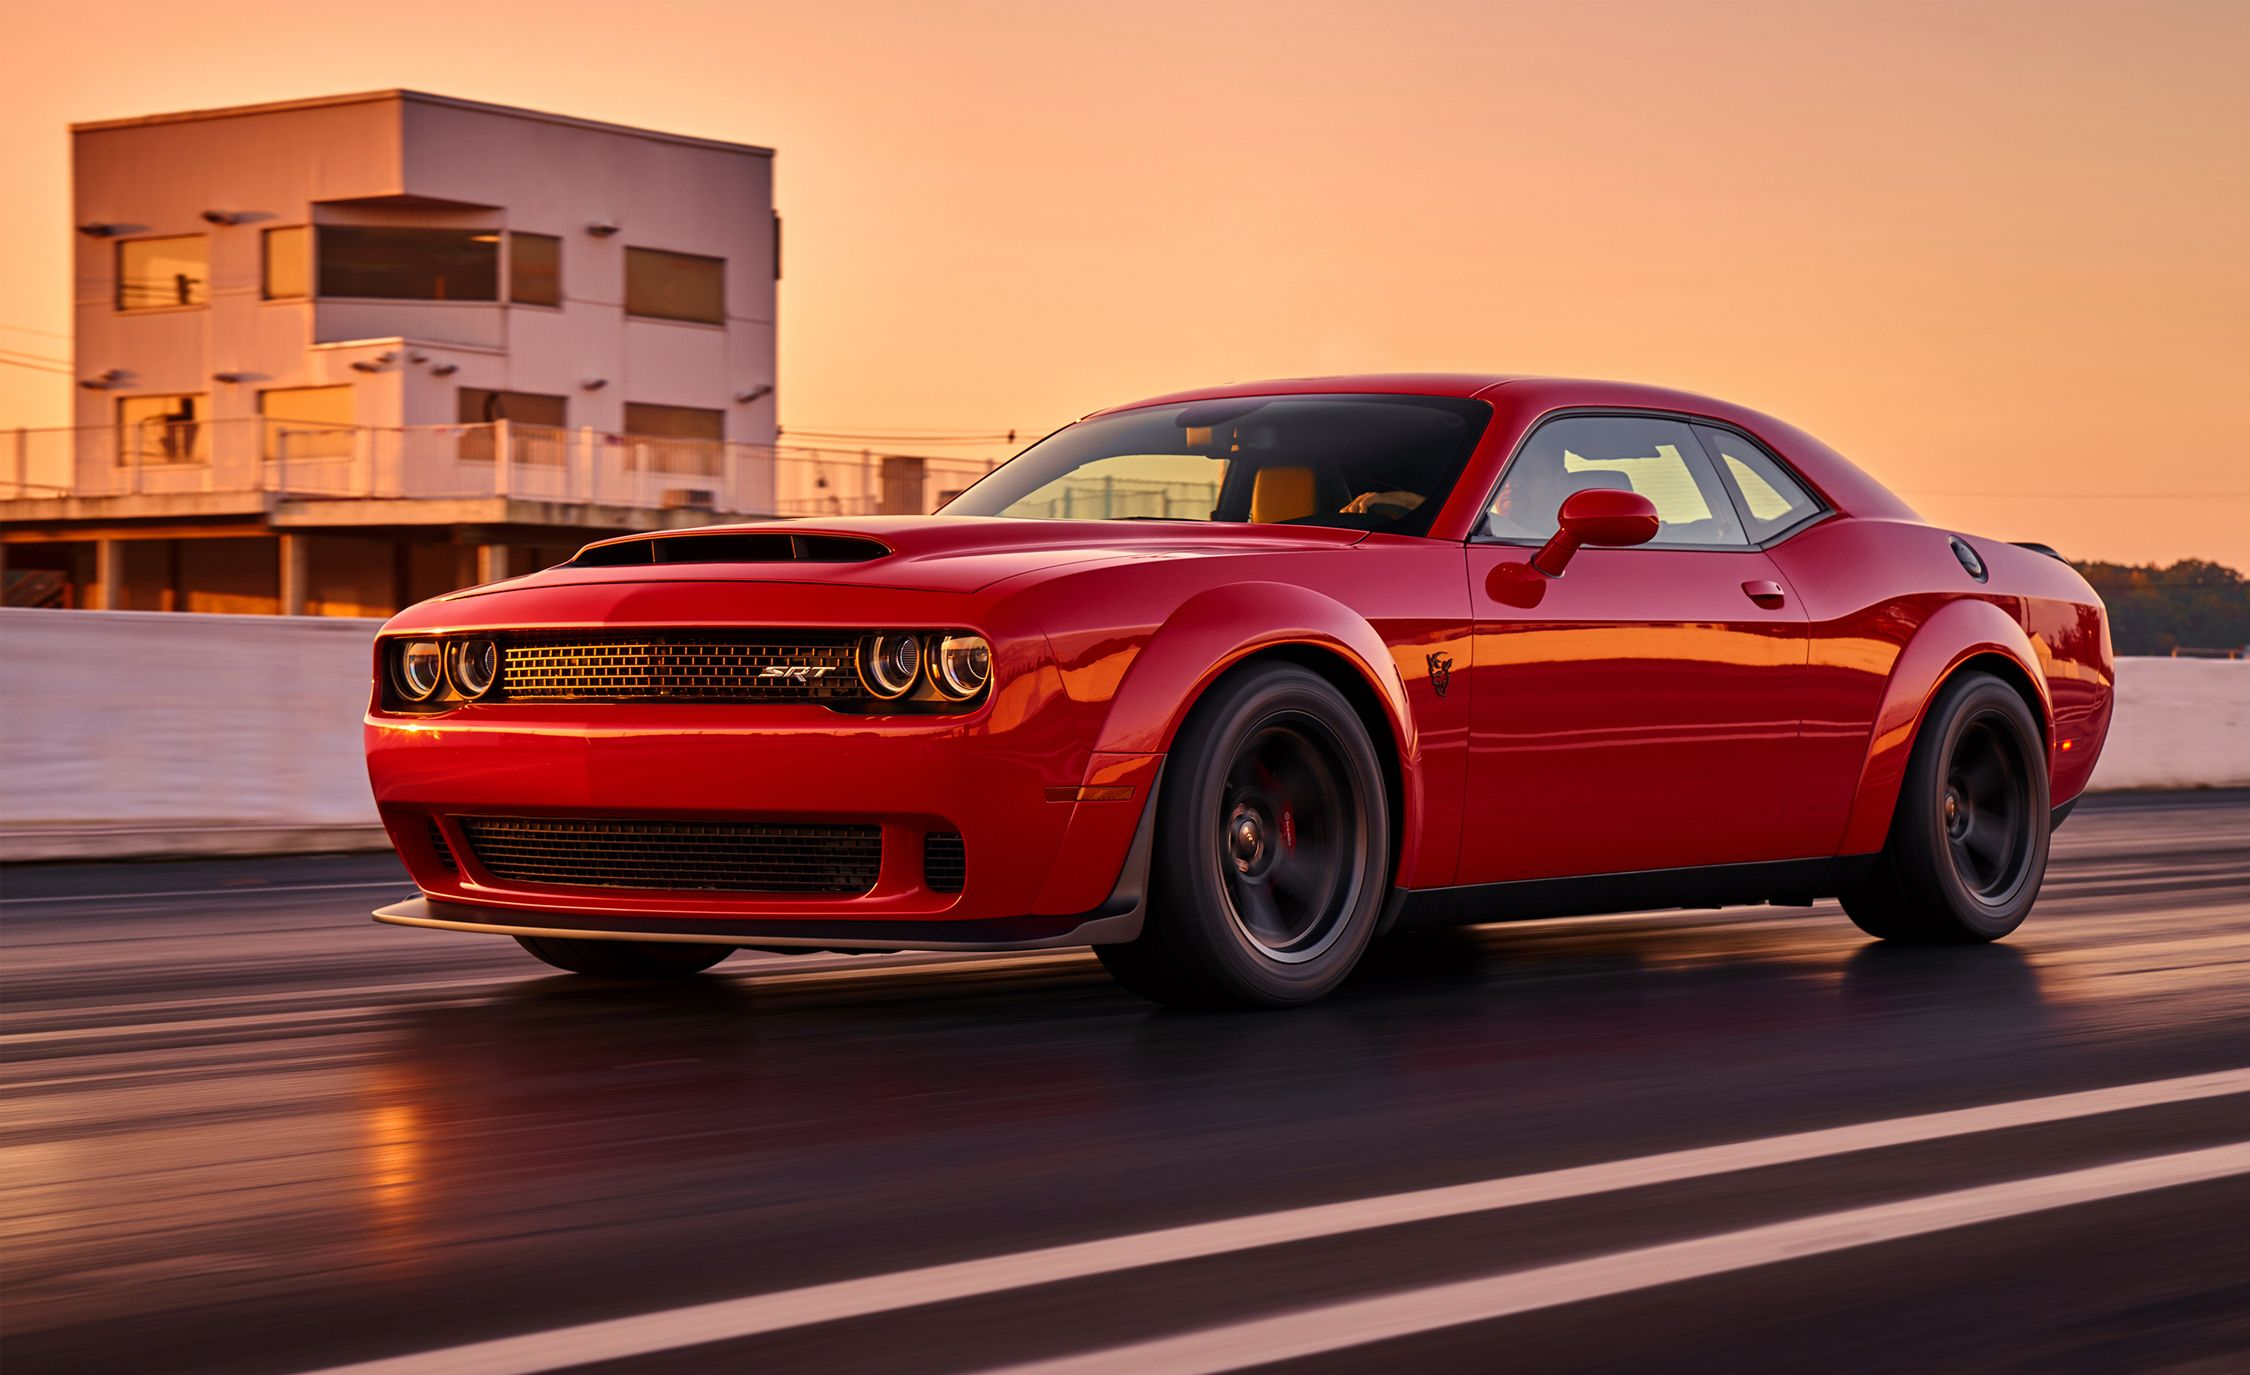 2018 Dodge Challenger Srt Demon Photos And Info  News